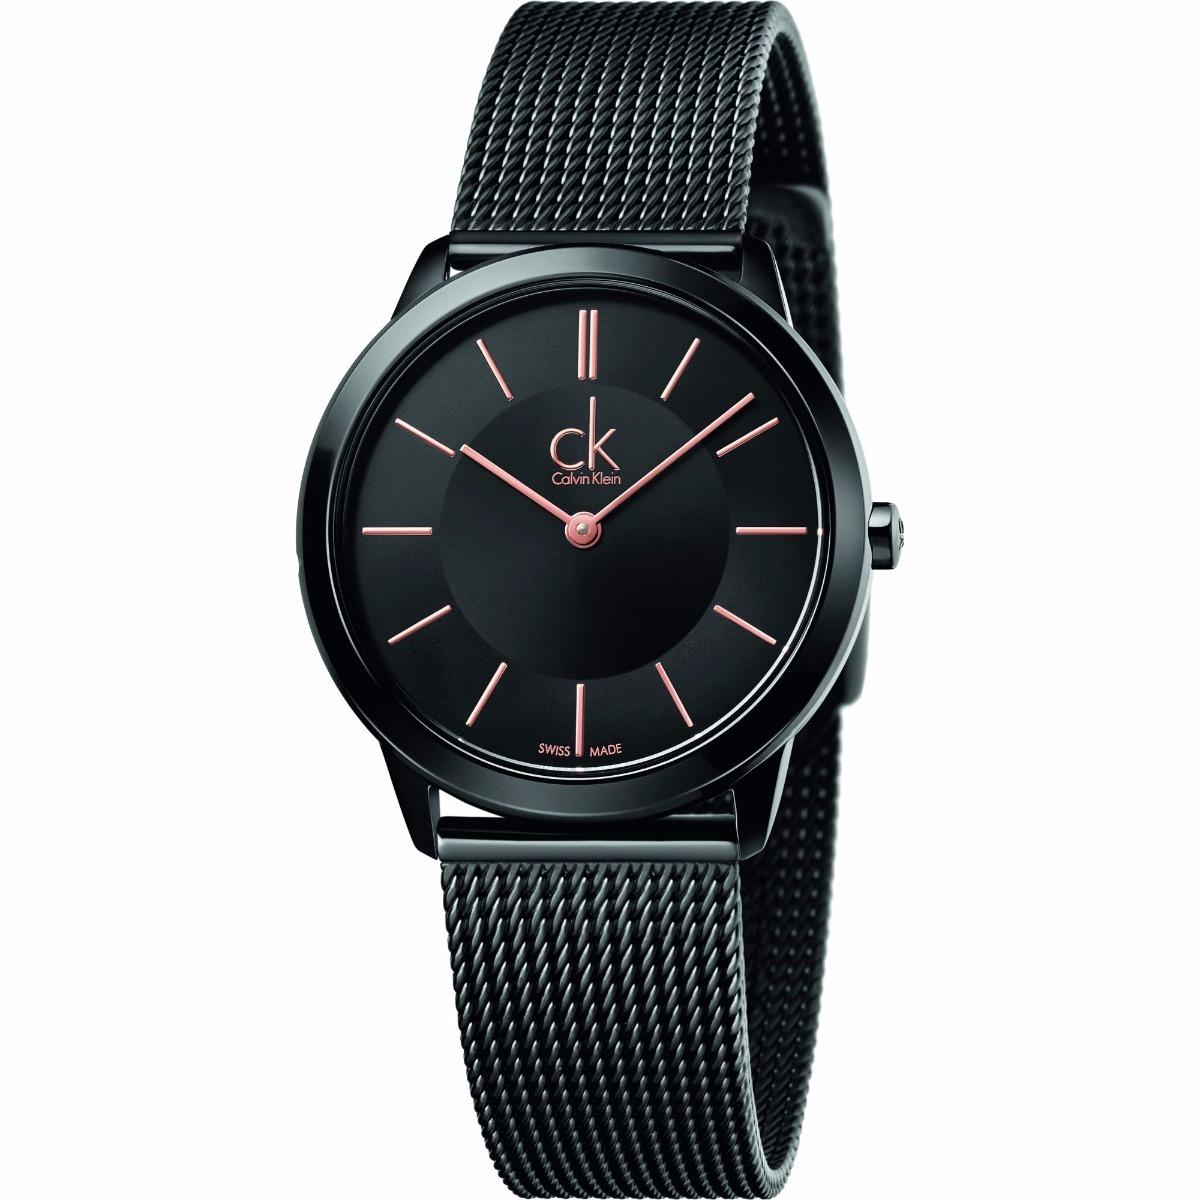 3a94486a3846 Reloj Calvin Klein Minimal K3m22421 Mujer